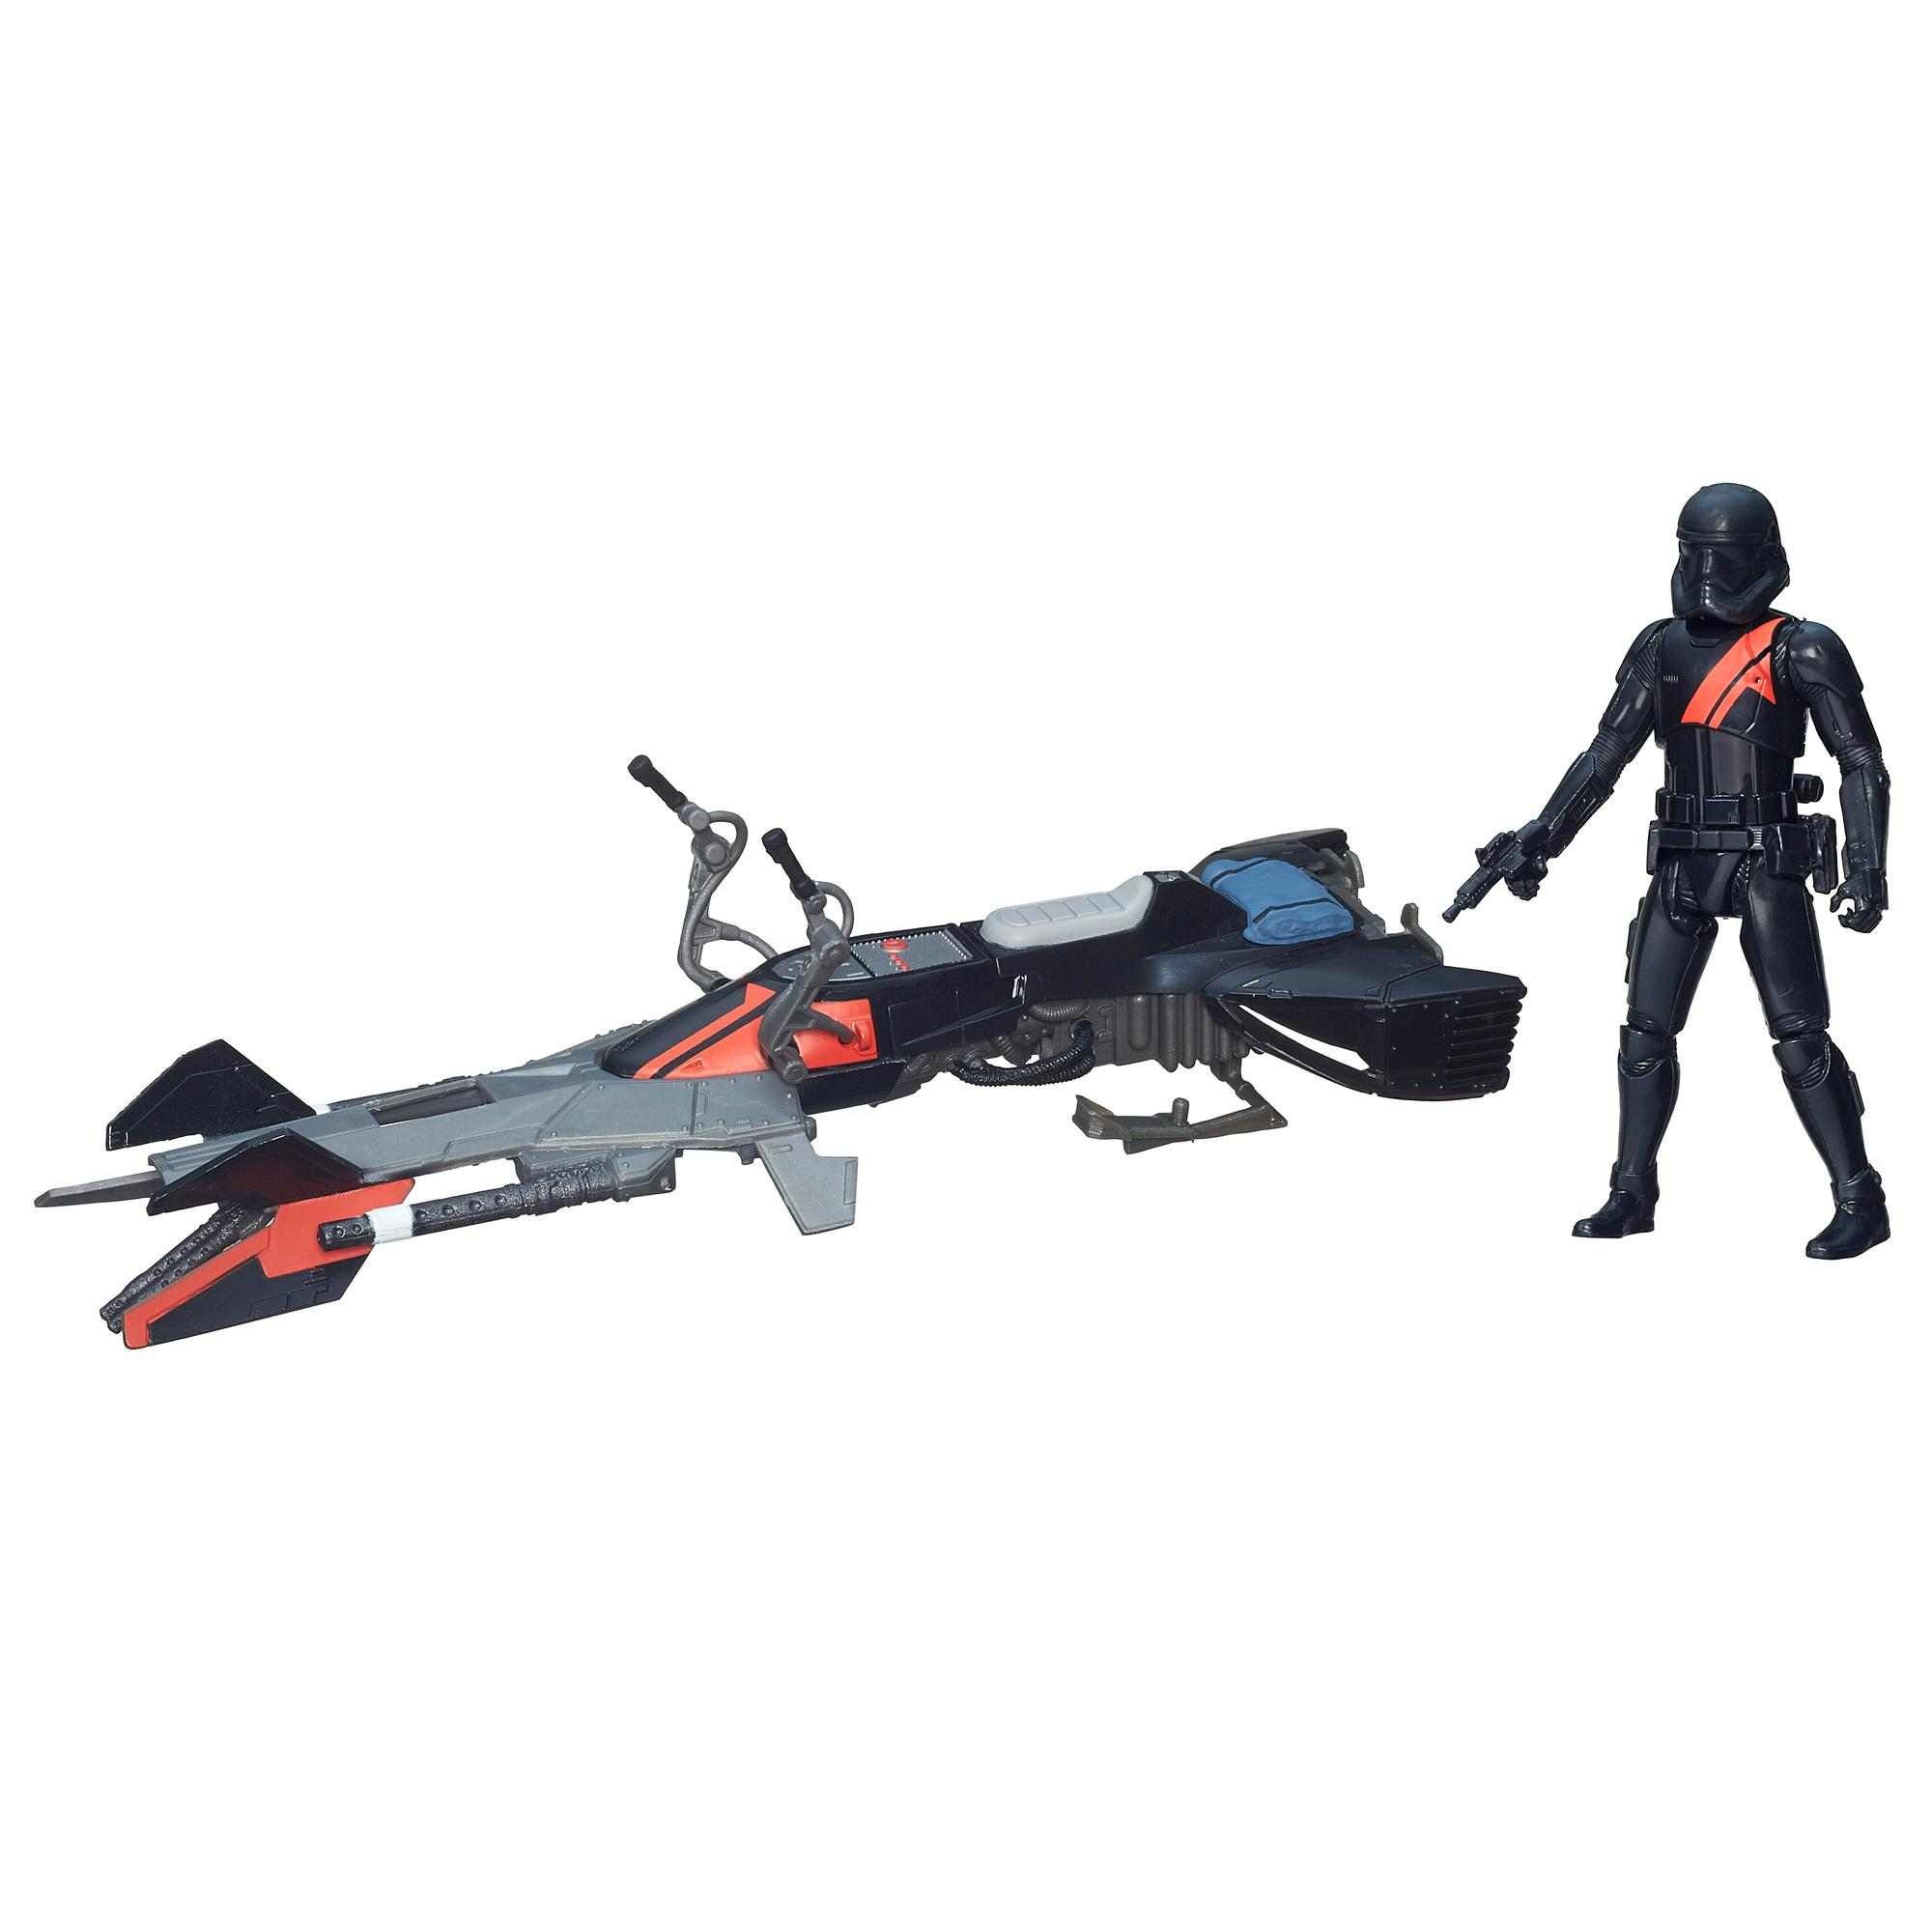 Star Wars The Force Awakens Vehículo de 9,50 cm (3,75 in) Moto deslizadora de Elite